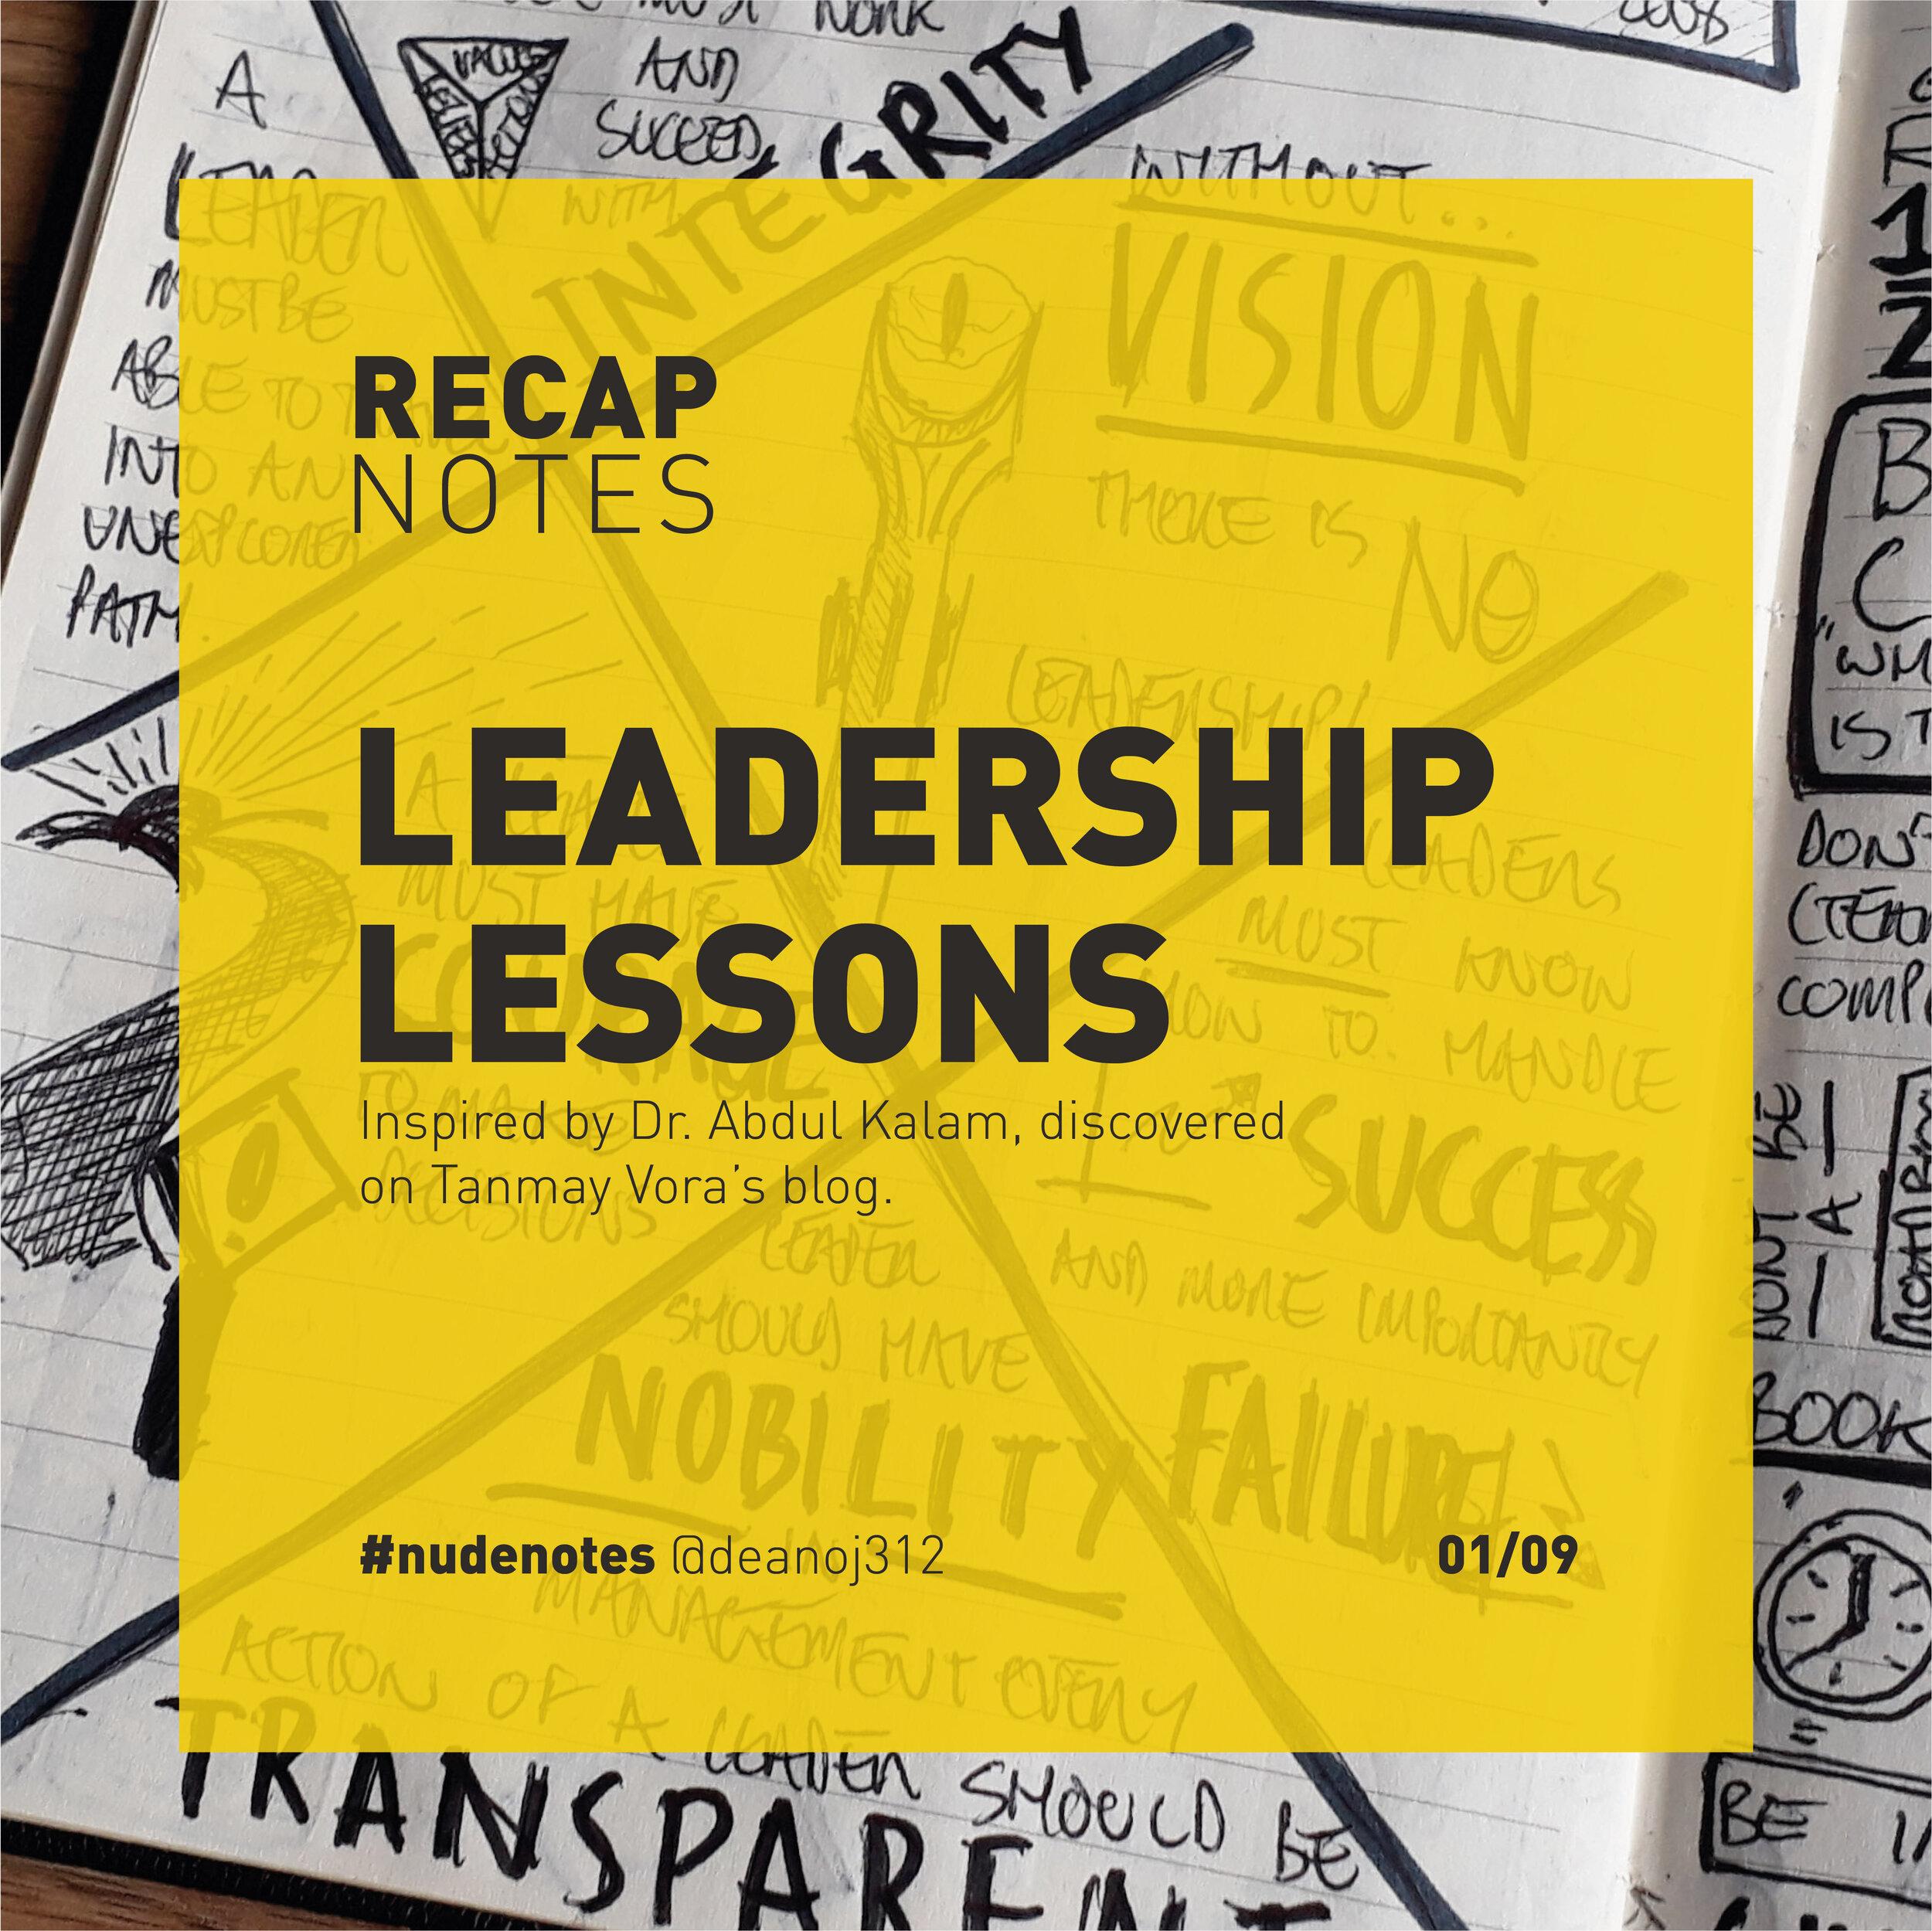 LeadershipLessons_RecapPost_1.jpg